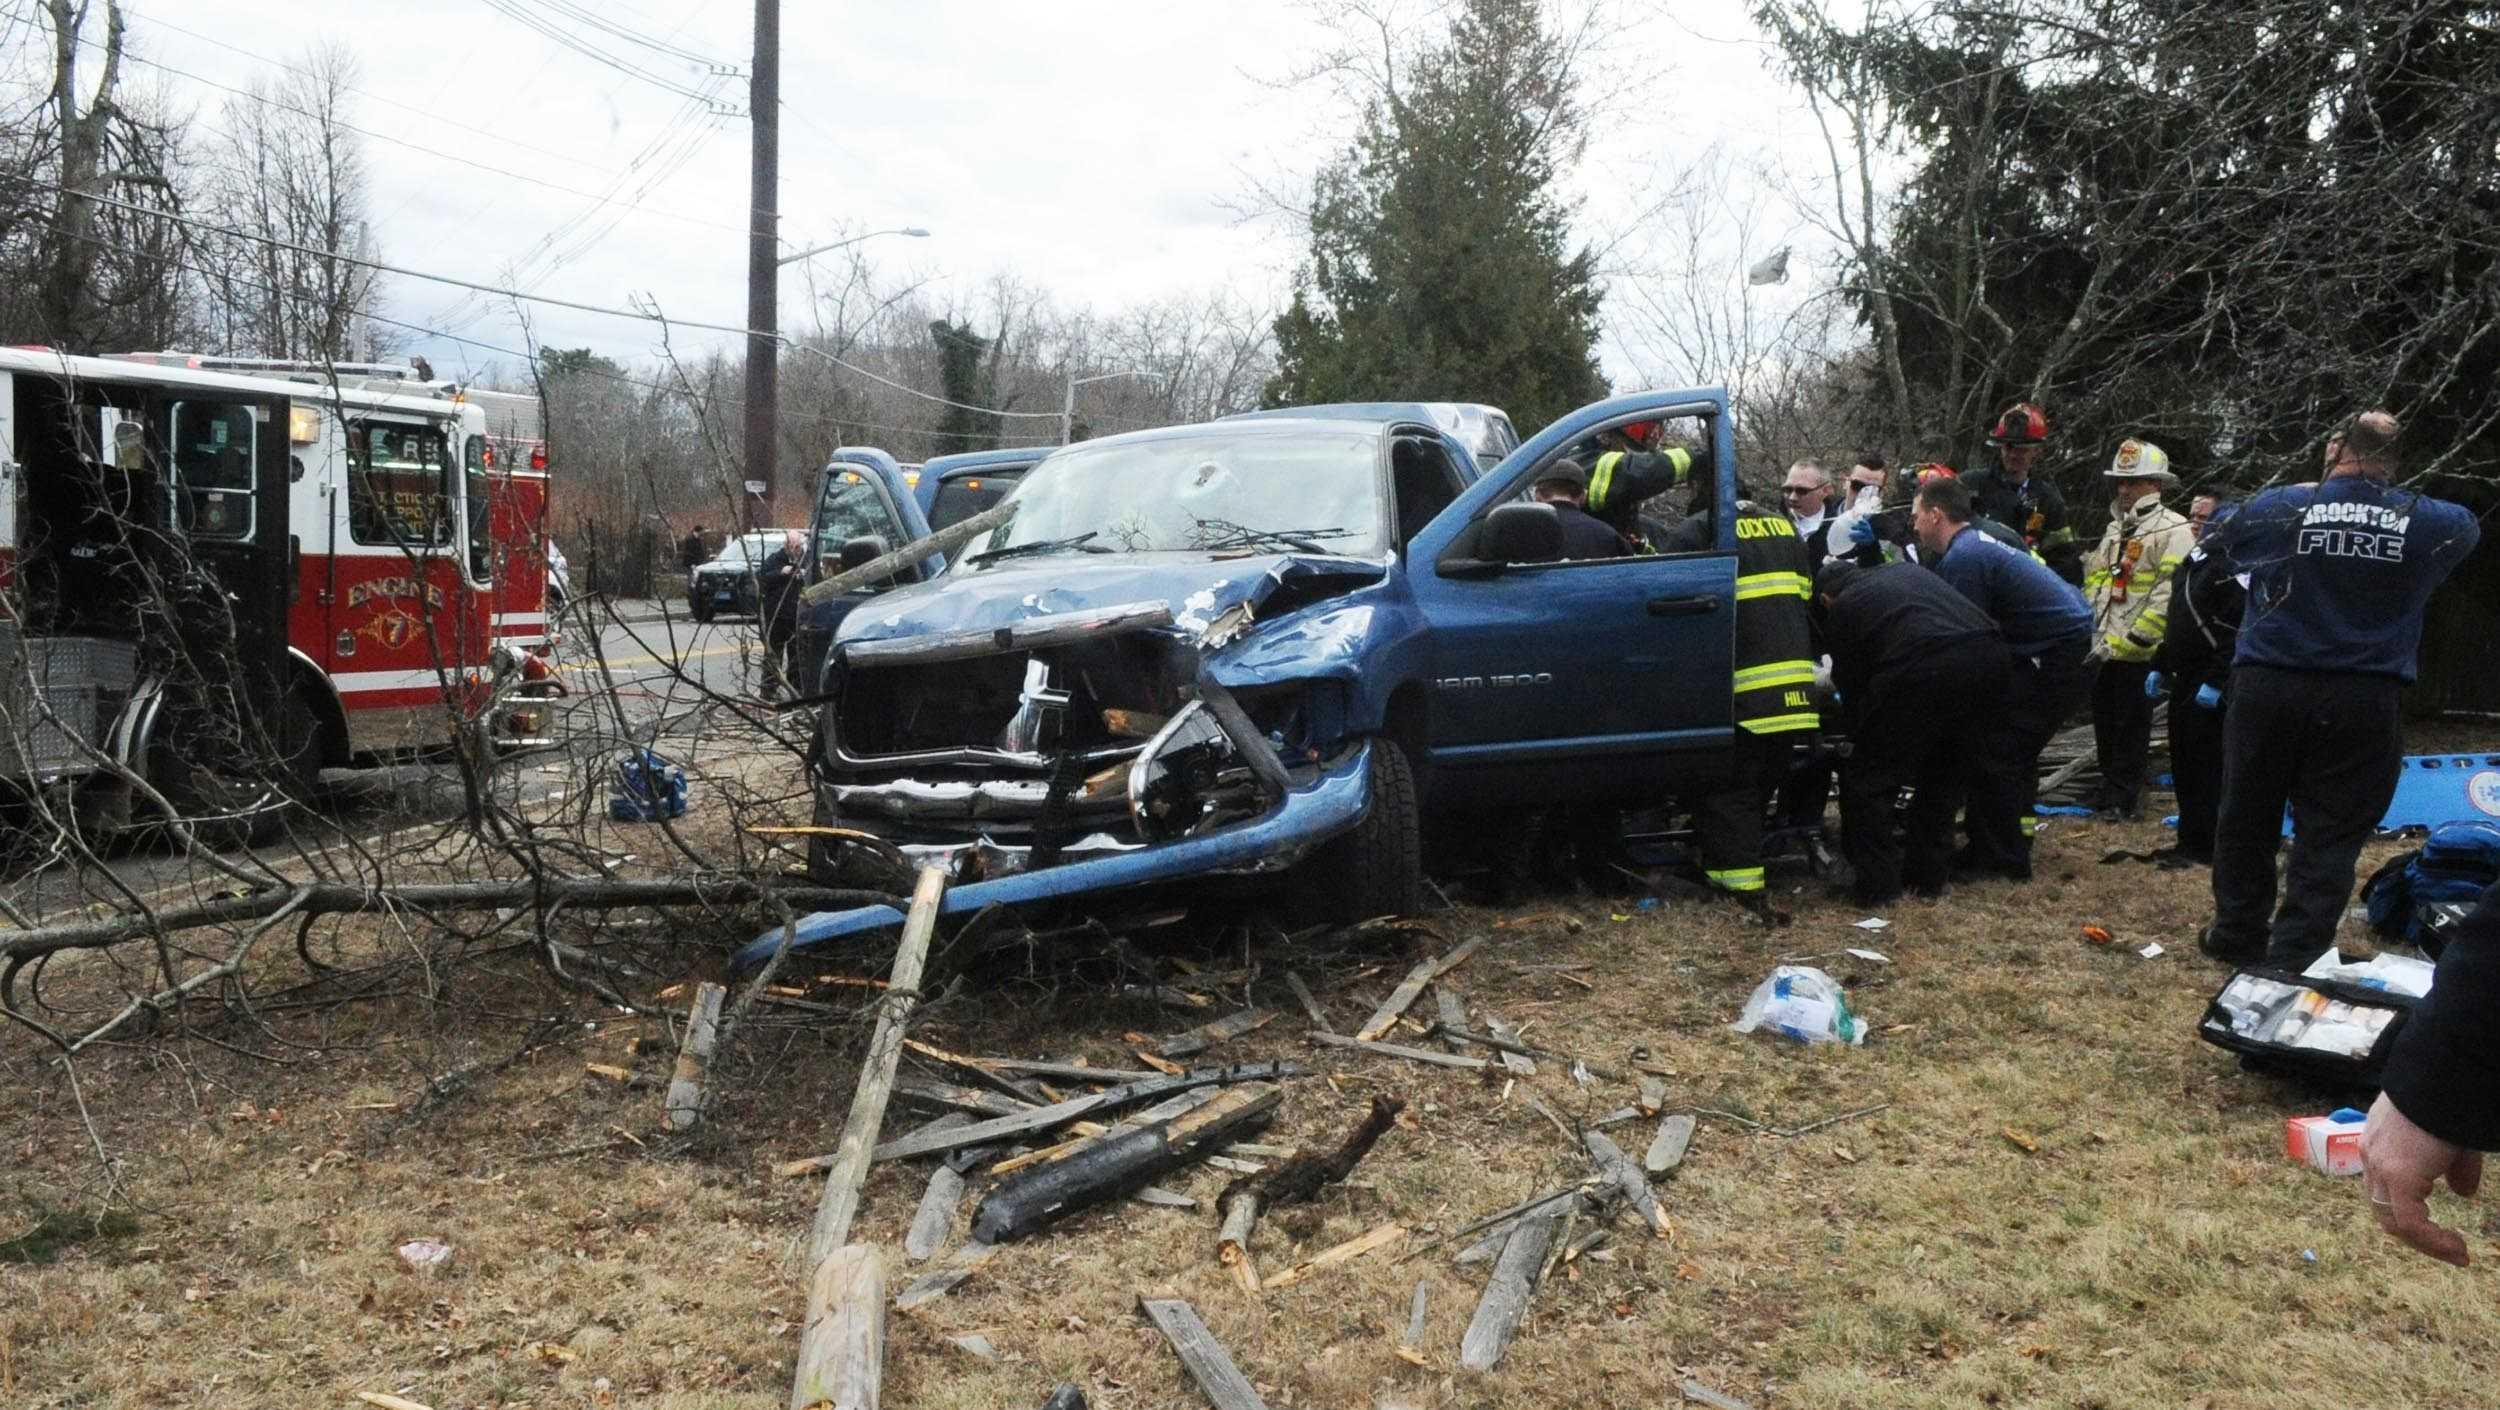 Brockton crash 3.8.17